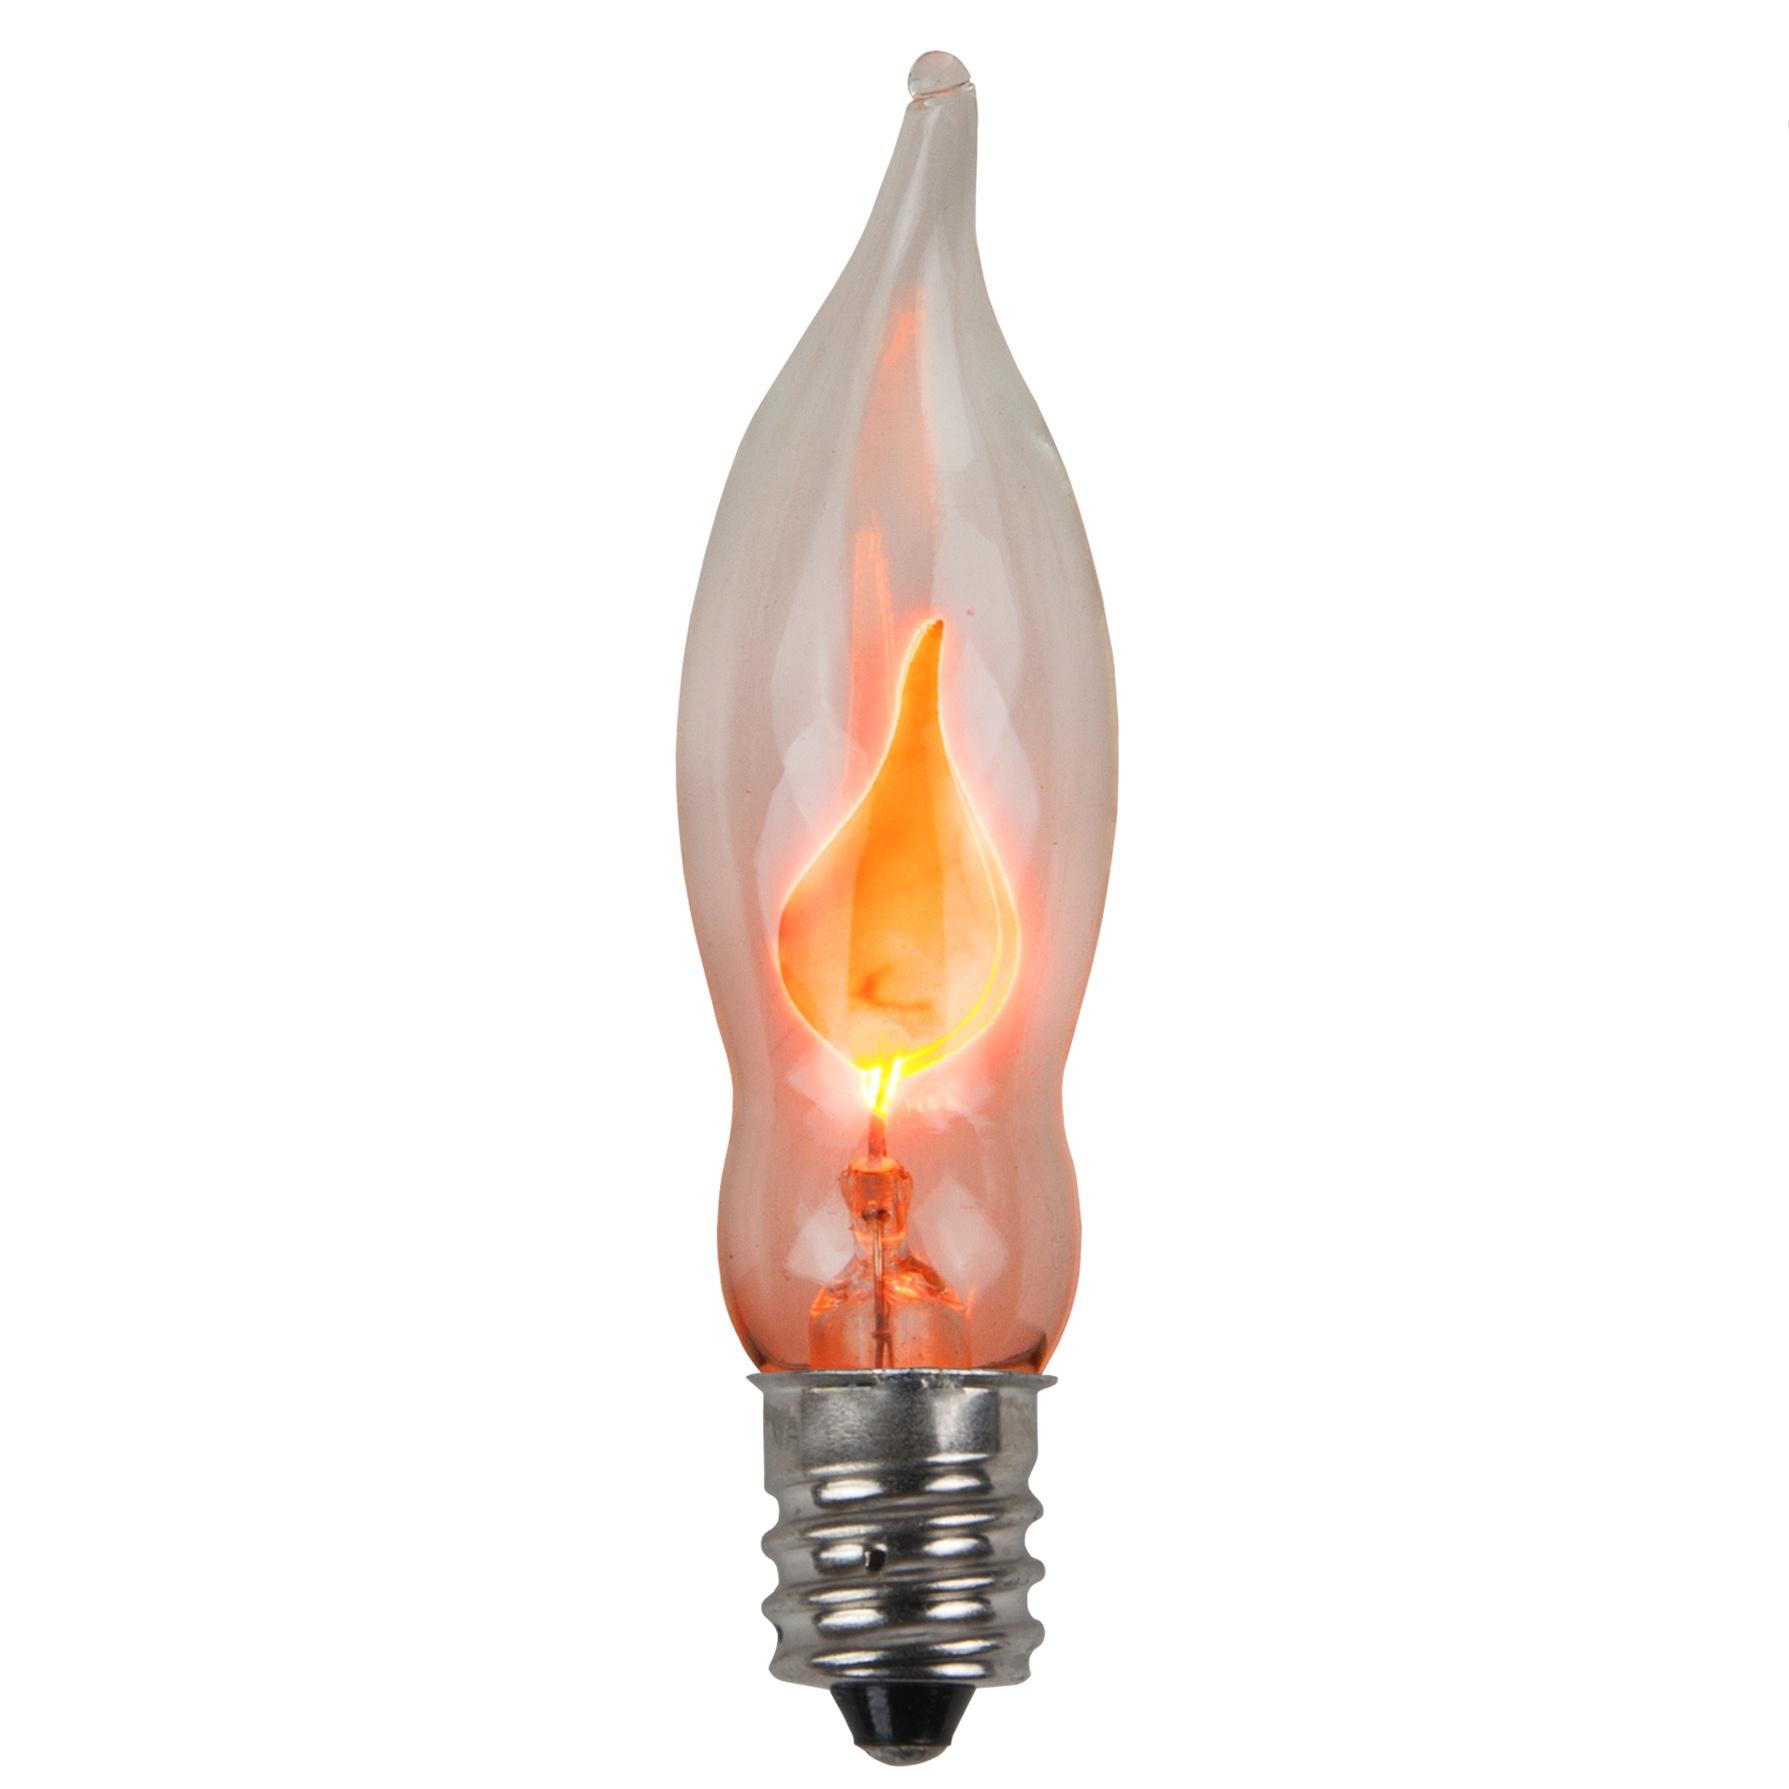 C7 Christmas Light Bulb C7 Flicker Flame Clear Christmas Light Bulbs Pack Of 2